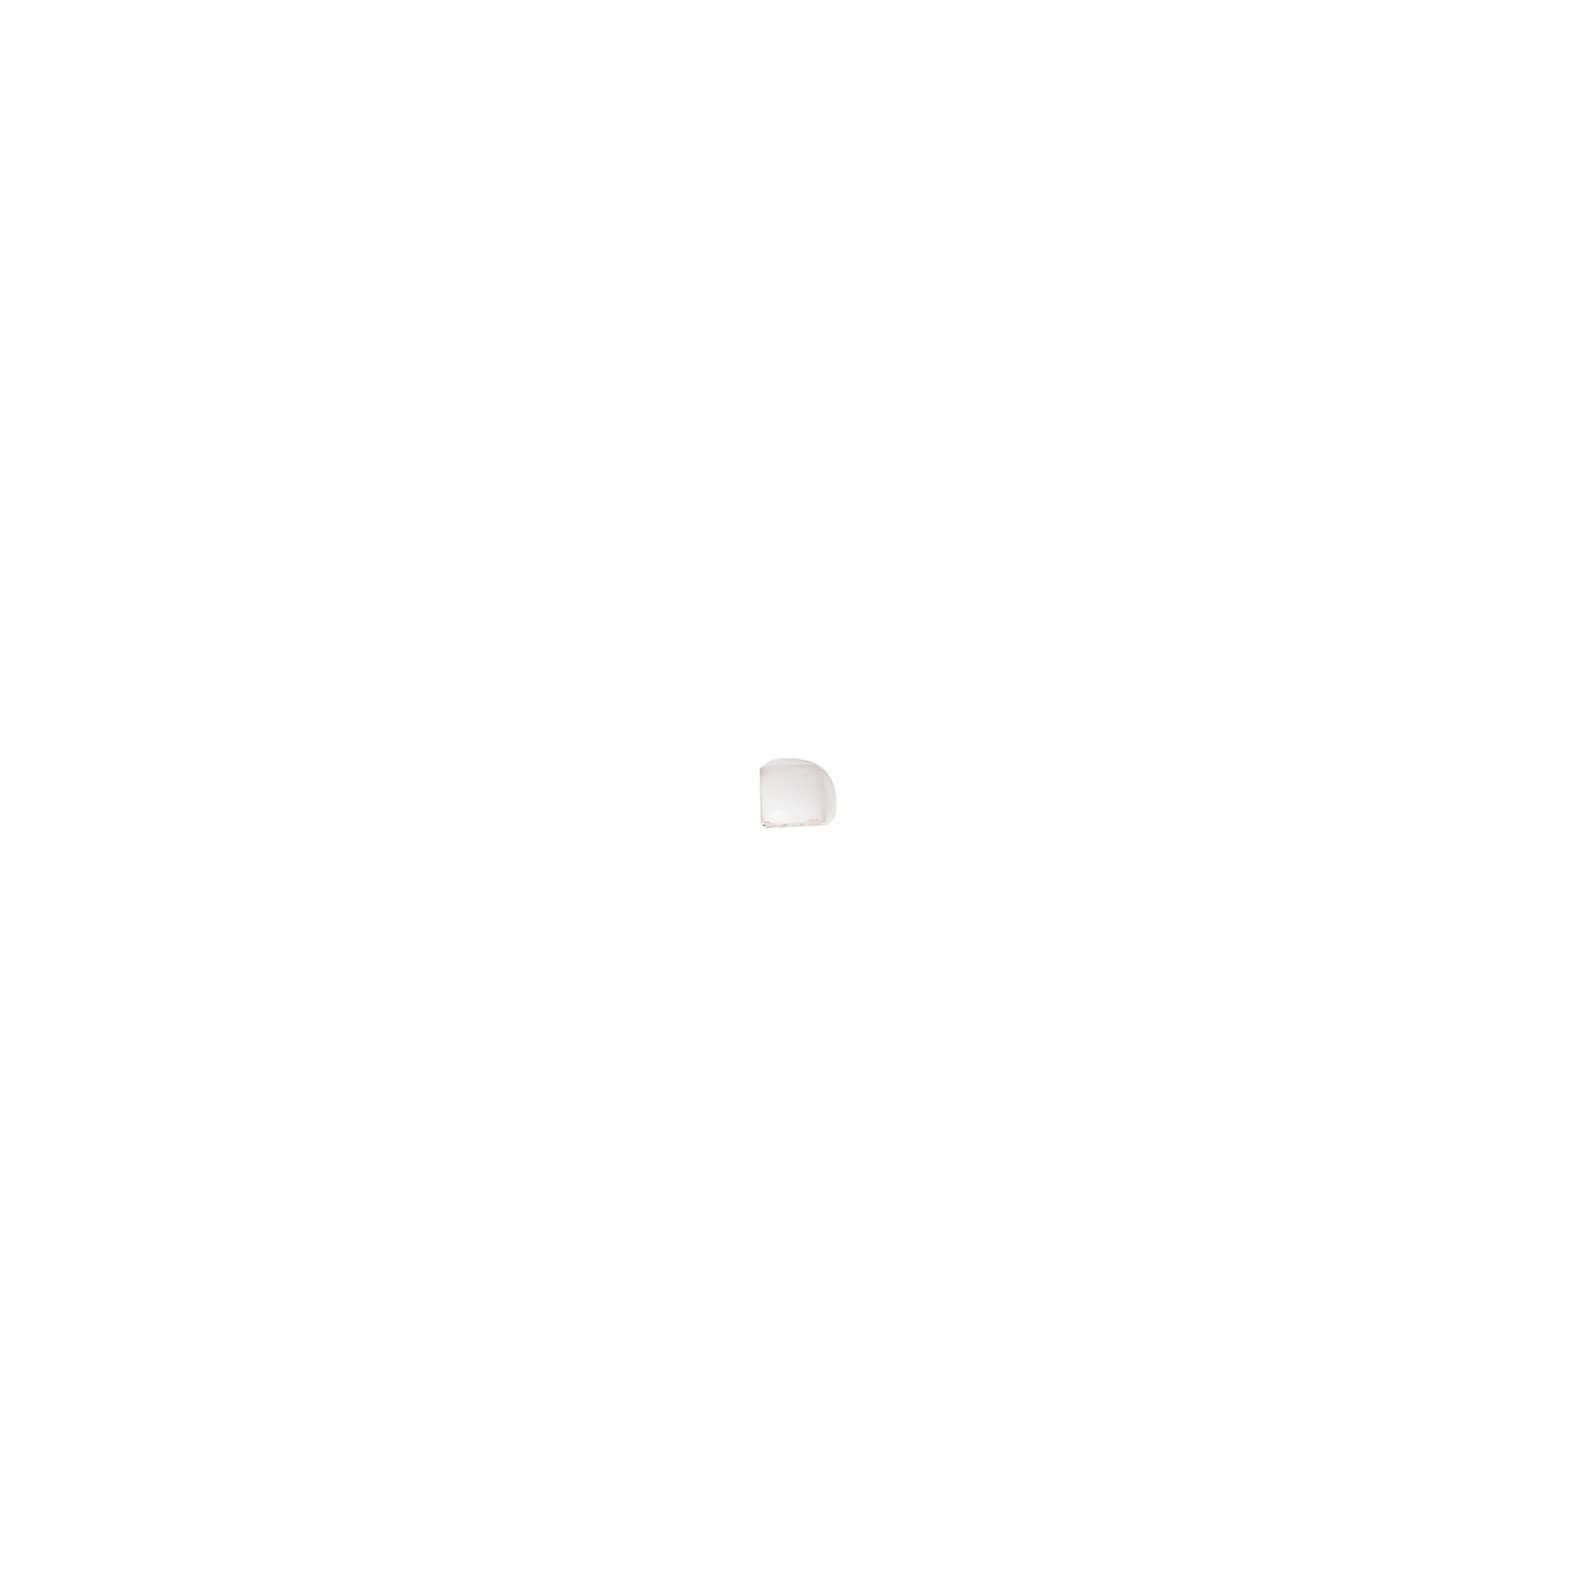 ADST5174 - ANGULO BULLNOSE TRIM